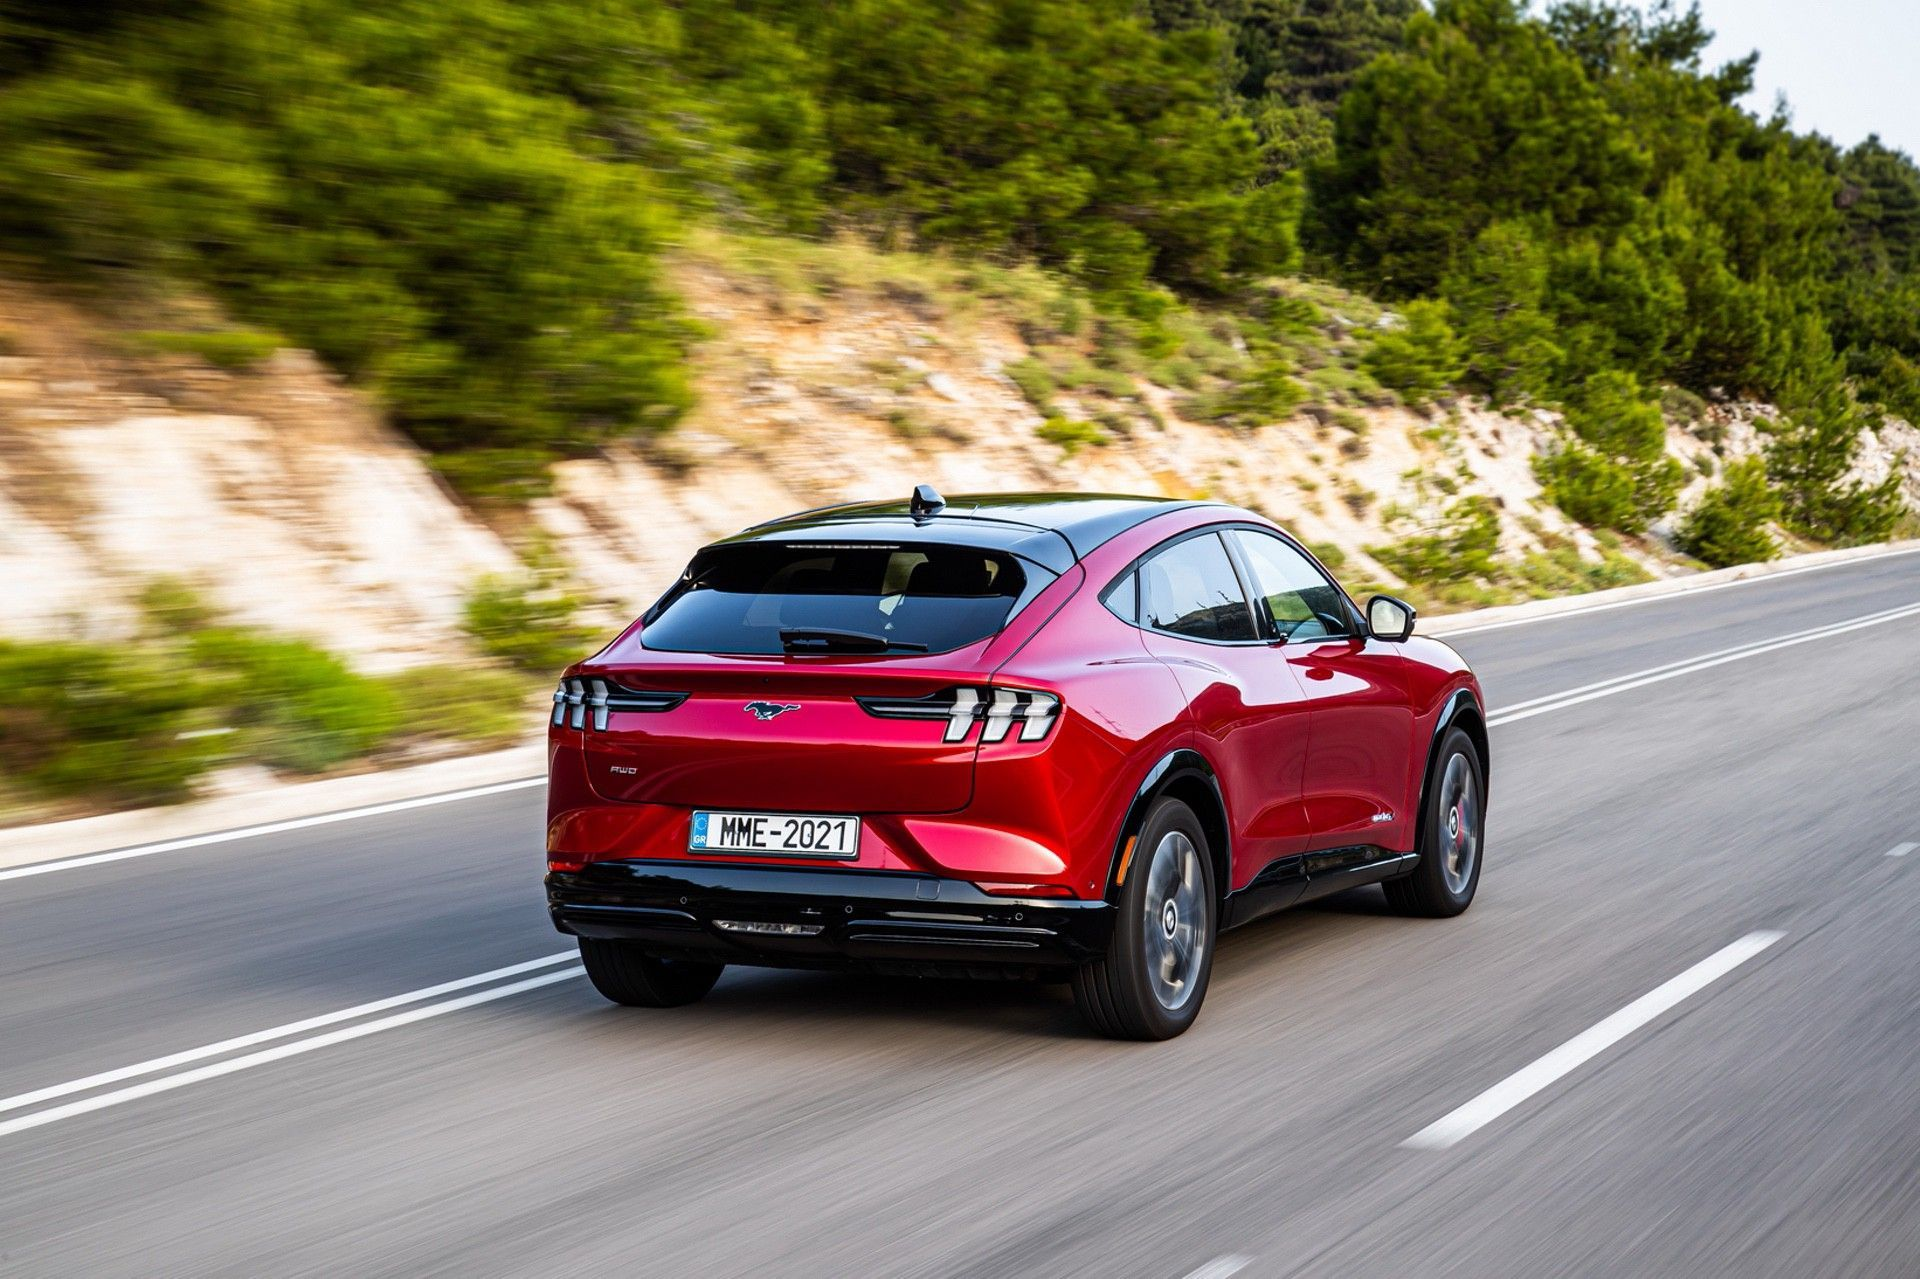 Ford_Mustang_Mach-E_greek_presskit-0119